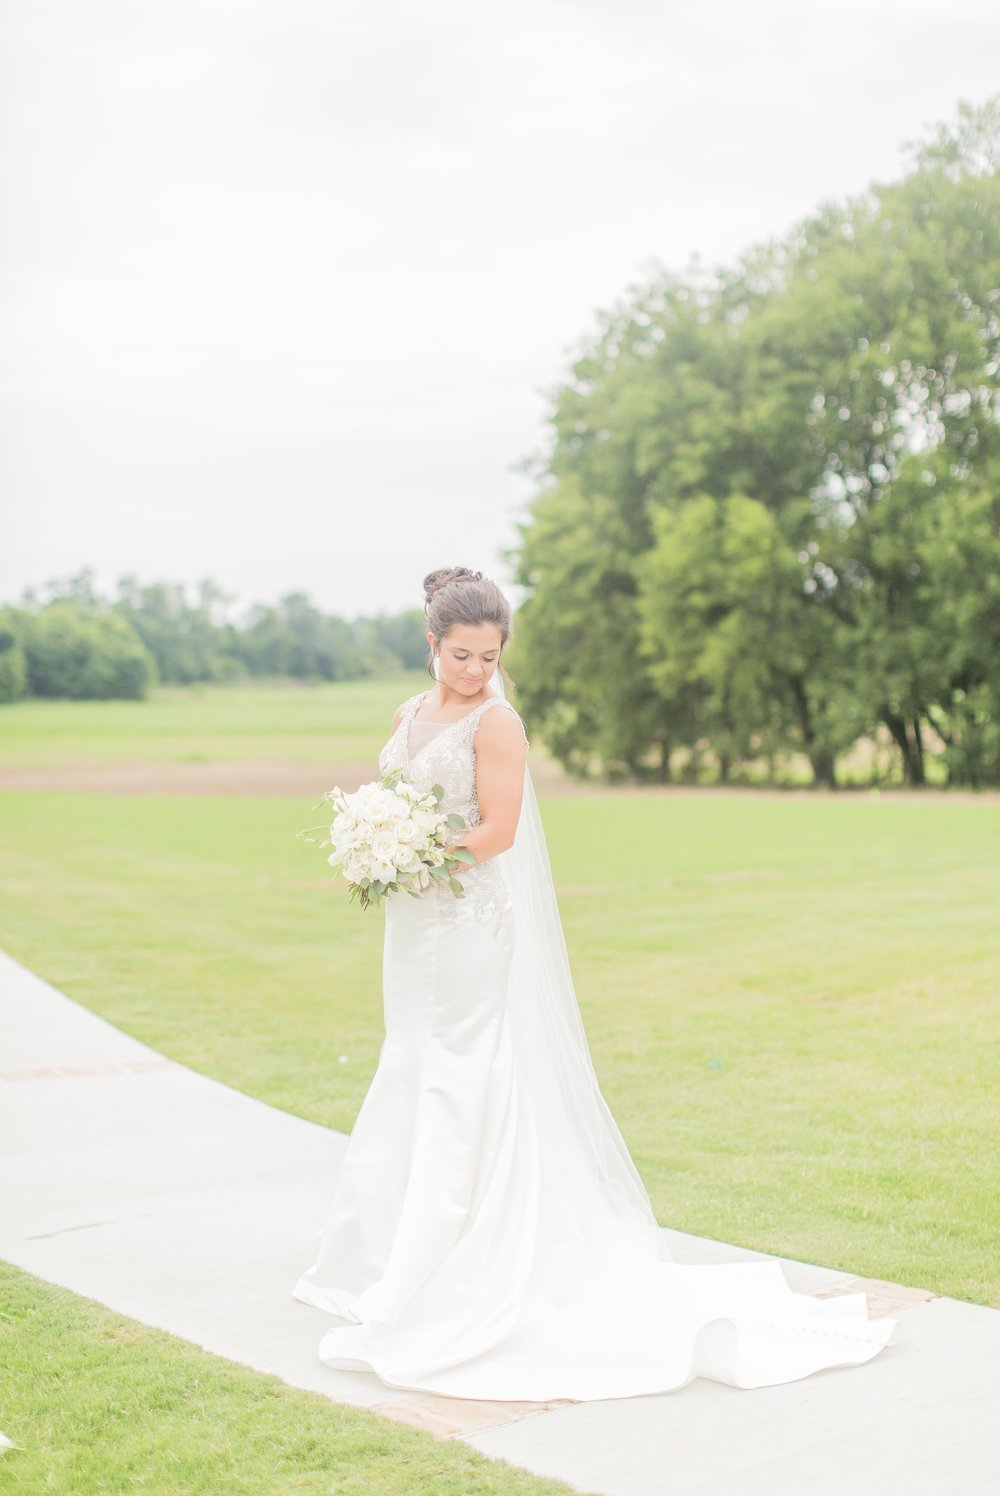 bridlewood-of-madison-mississippi-wedding 28.jpg